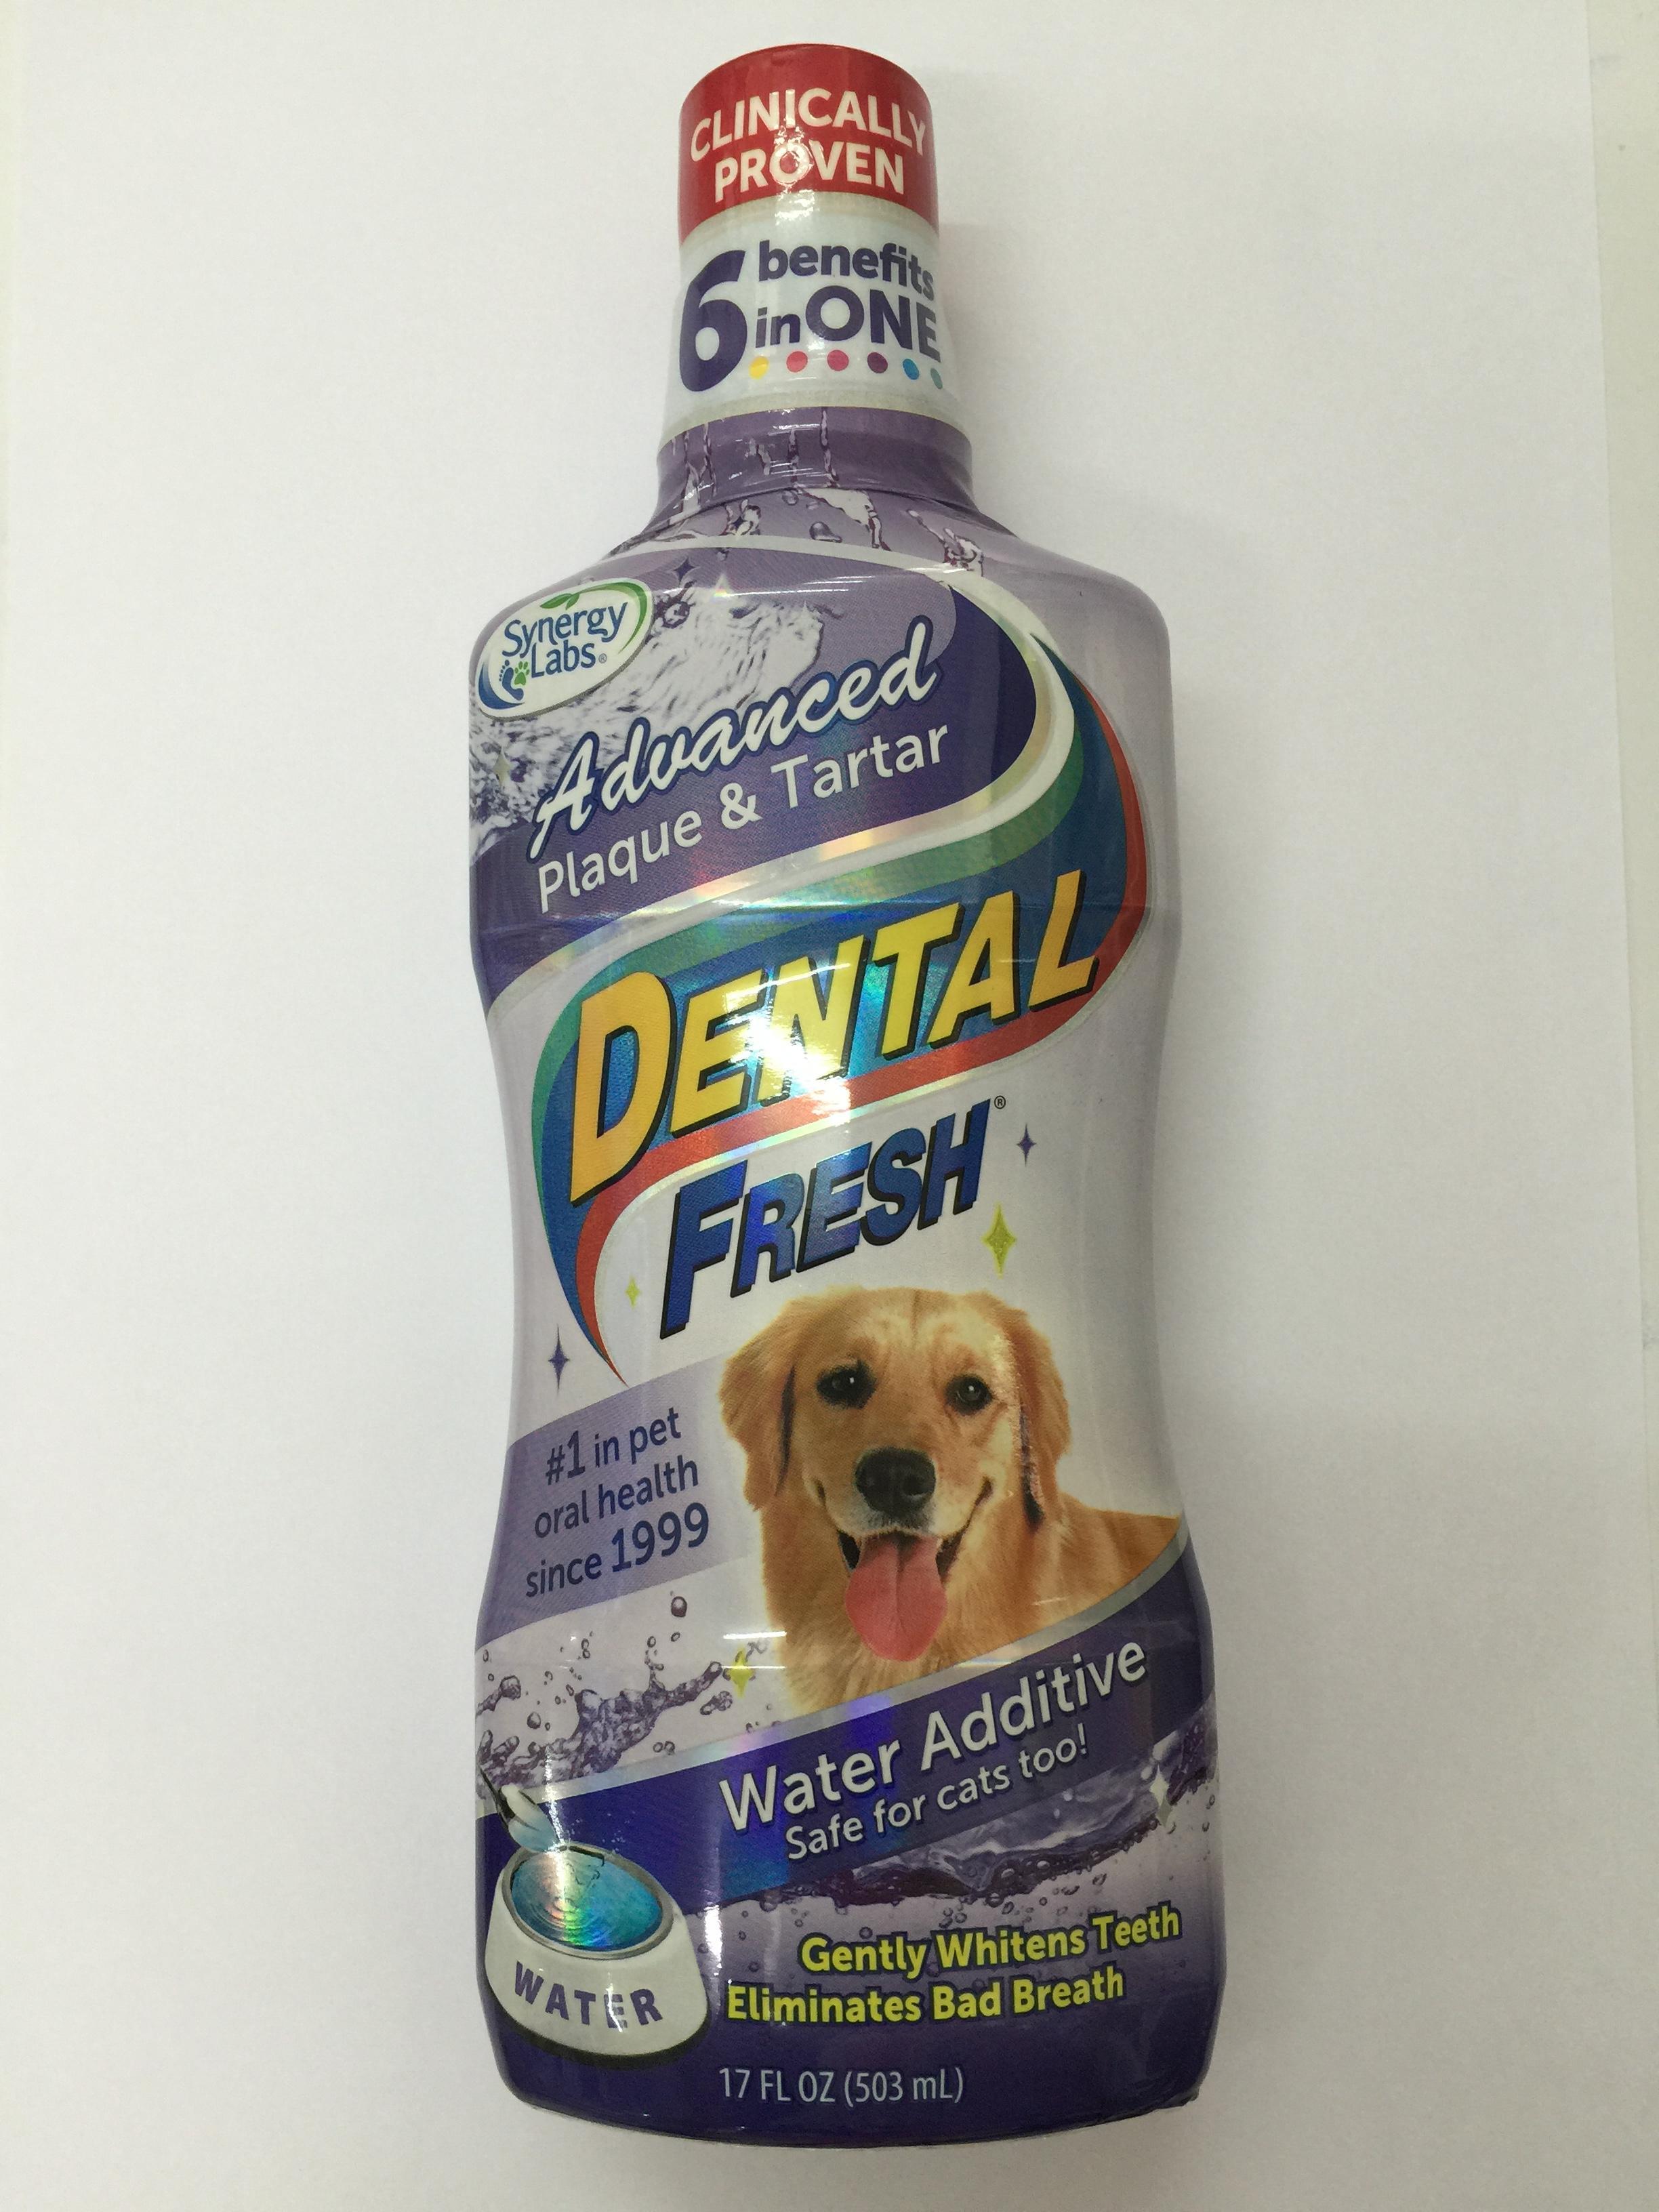 Dental Fresh ขนาด 503 มล. สูตรDental Fresh ขจัดกลิ่นปากยับยั้งการเกิดหินปูน (Exp.07/18)